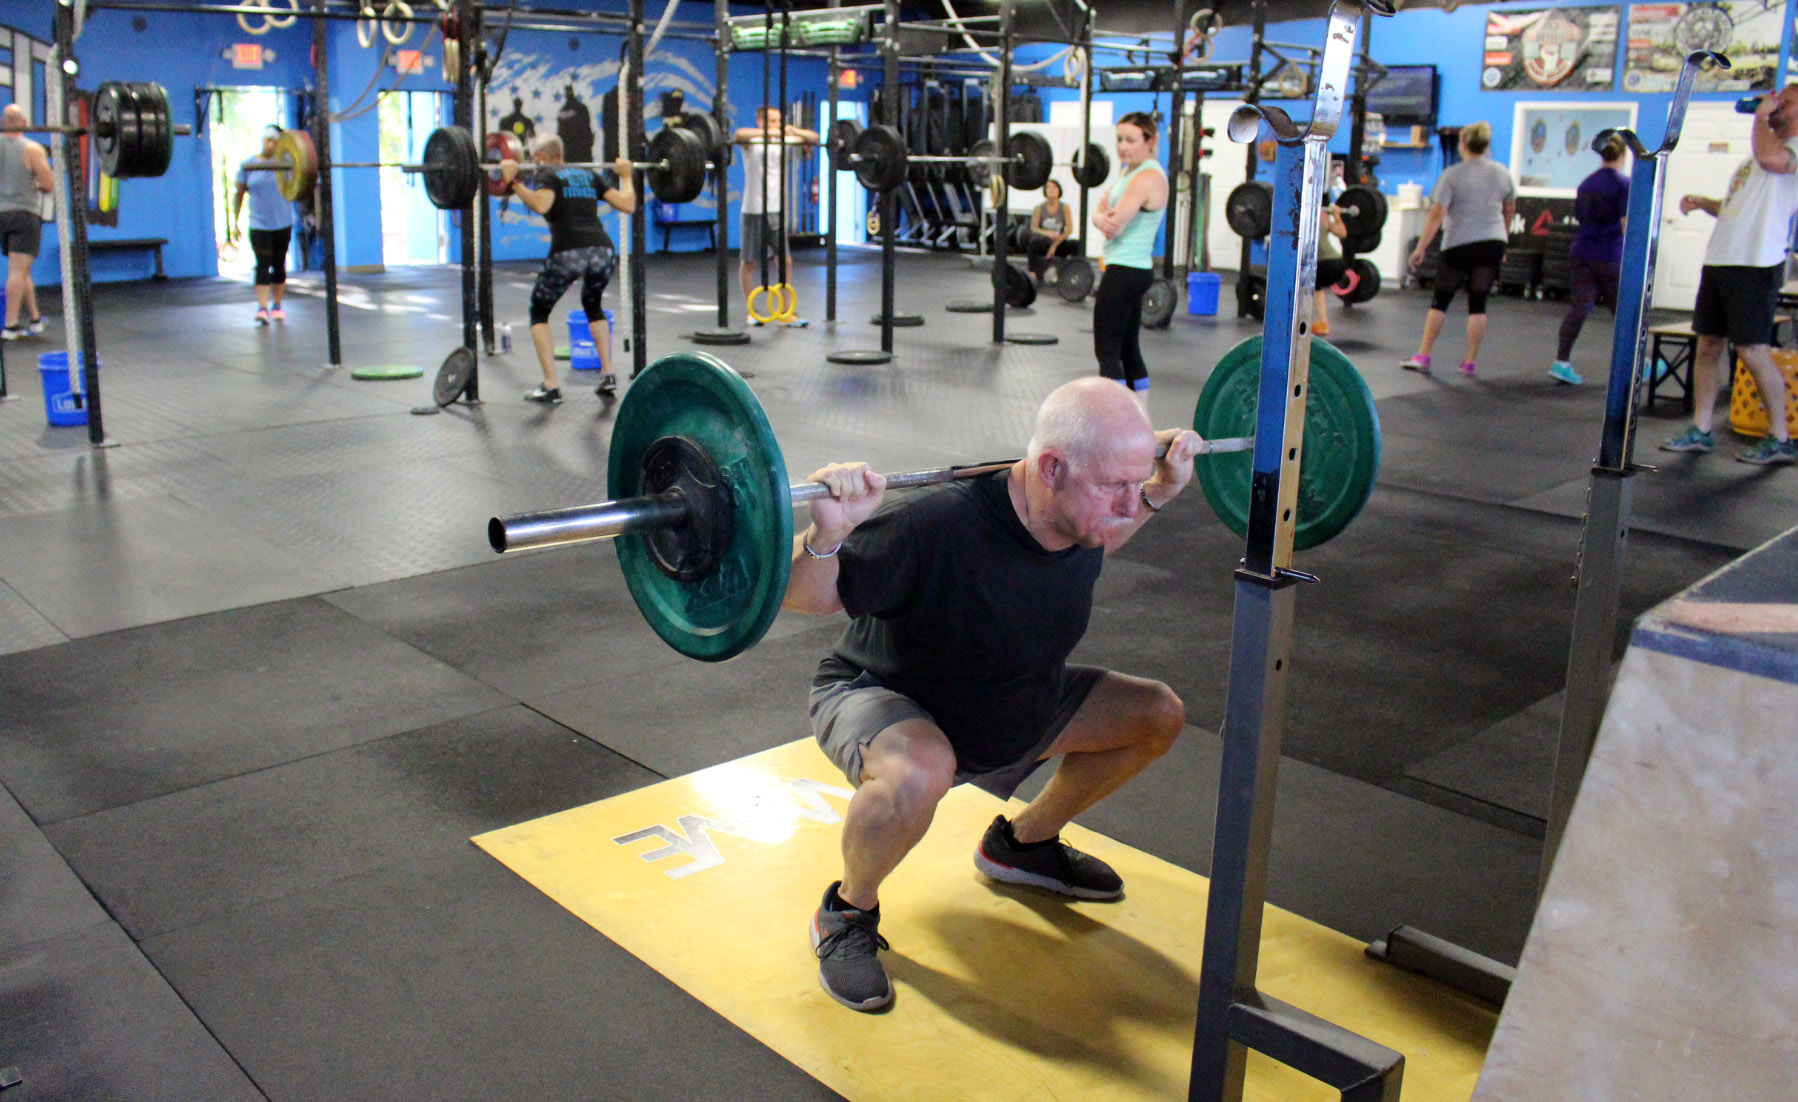 Gene back squatting